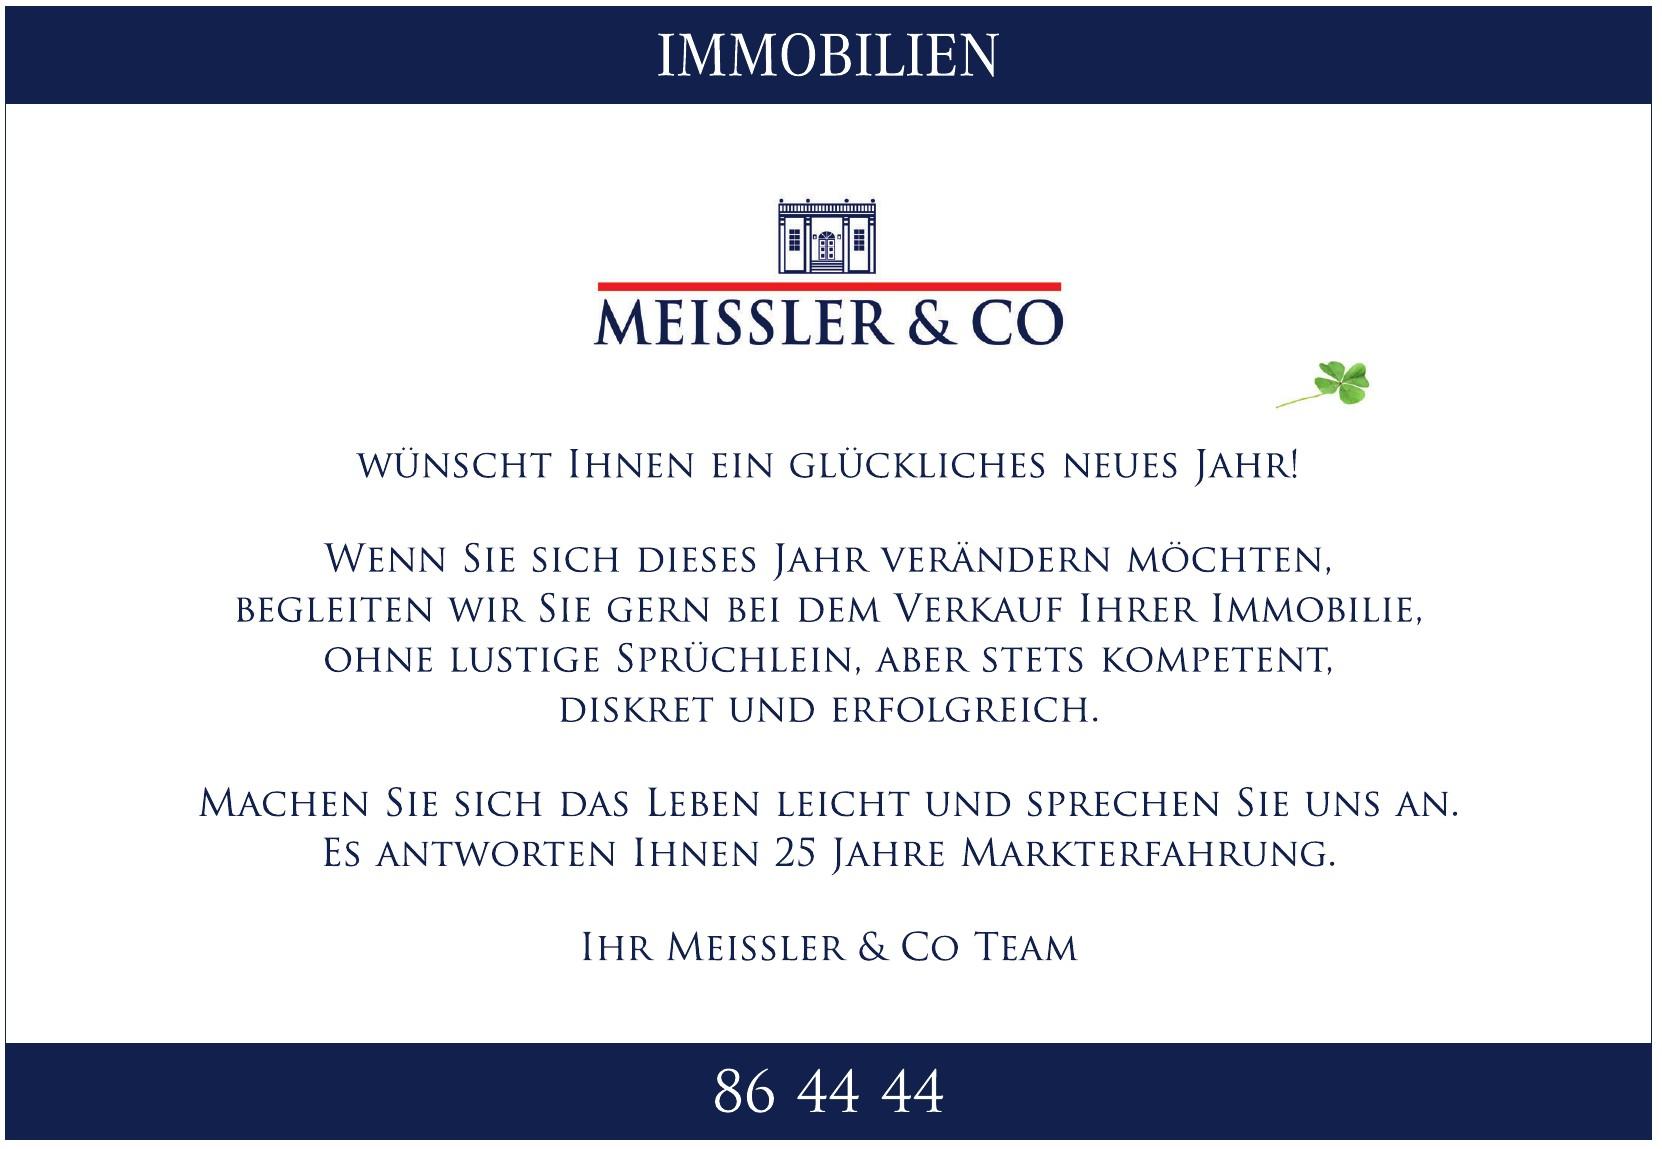 Meissler & Co